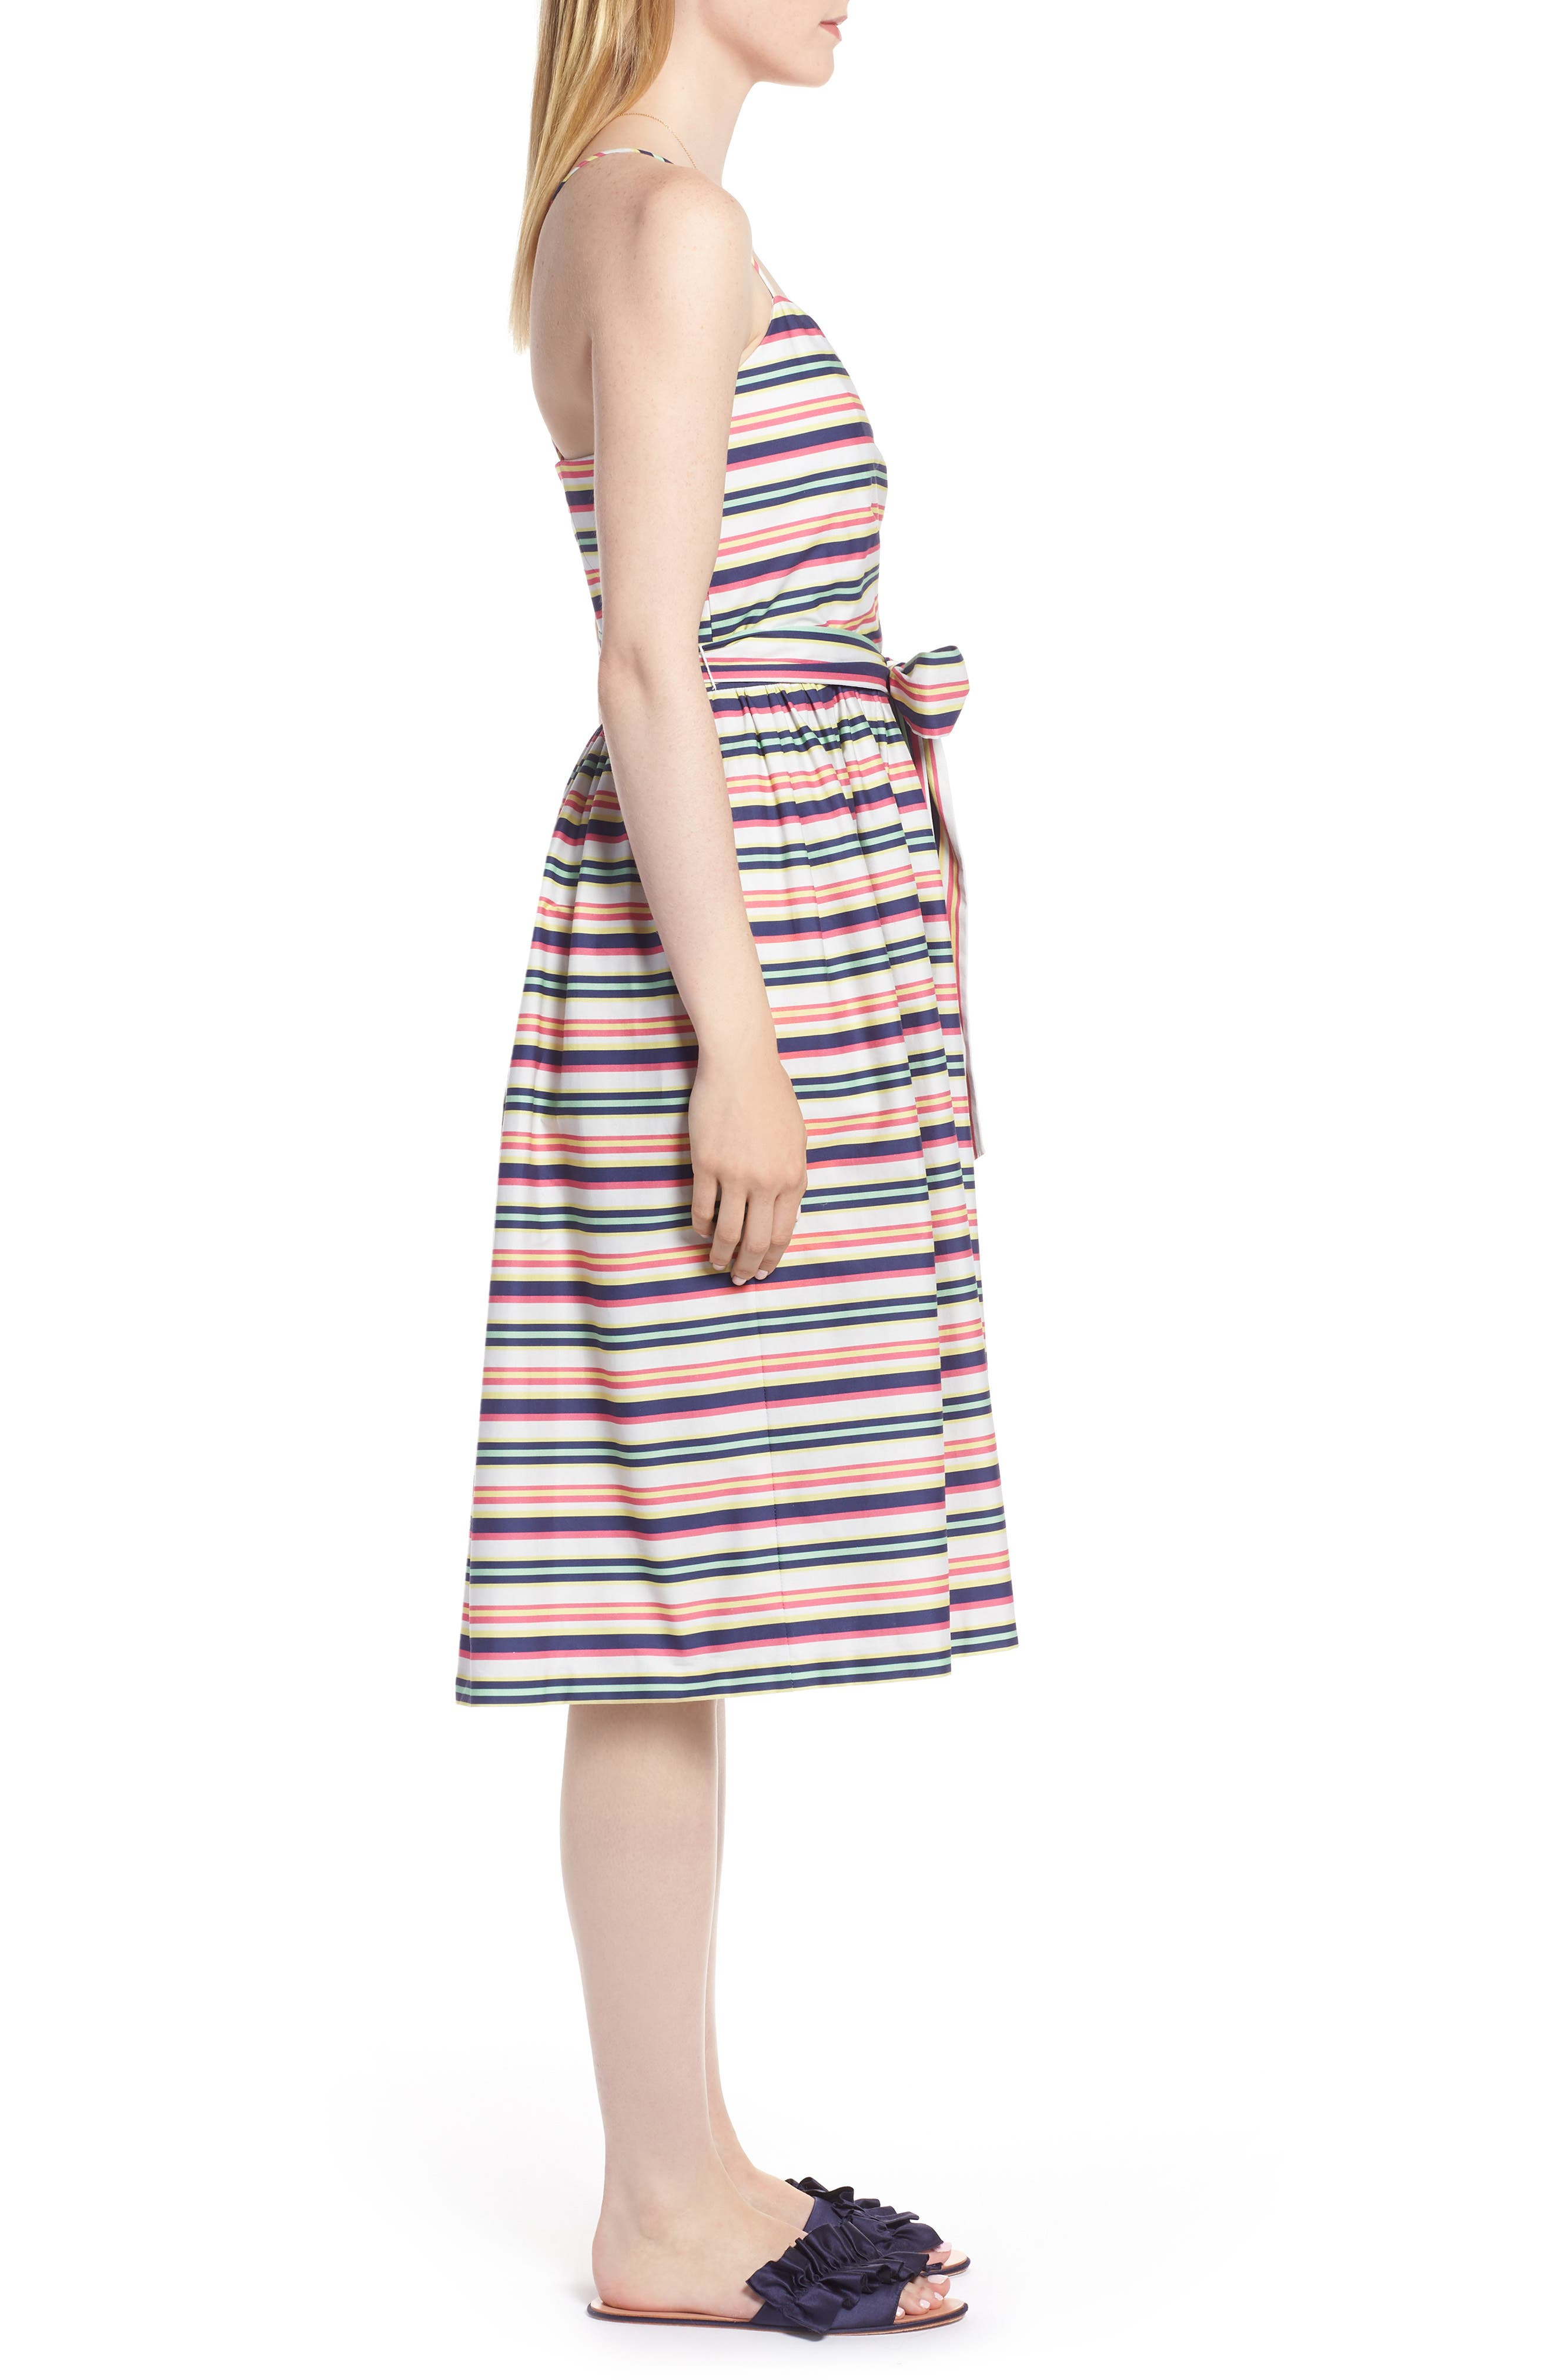 Stripe Strappy Cotton Dress,                             Alternate thumbnail 3, color,                             NAVY PINK COMBO STRIPE